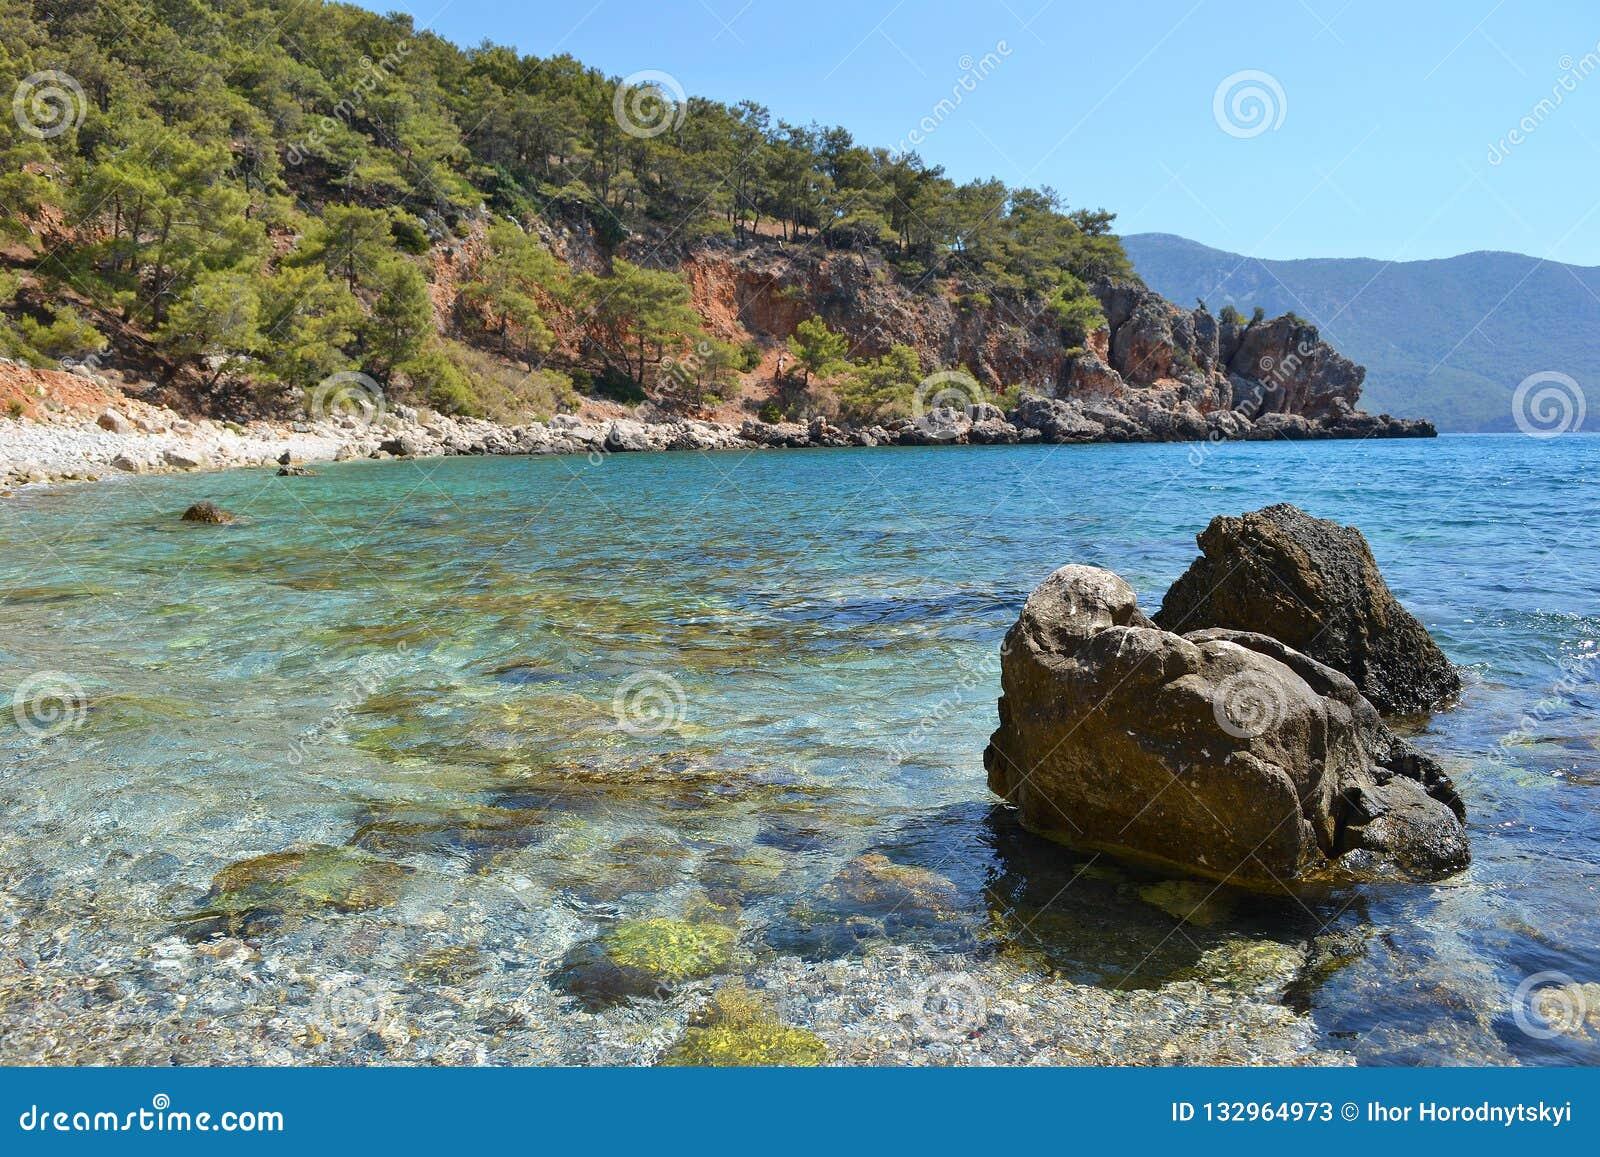 Stones in a beautiful azure sea bay